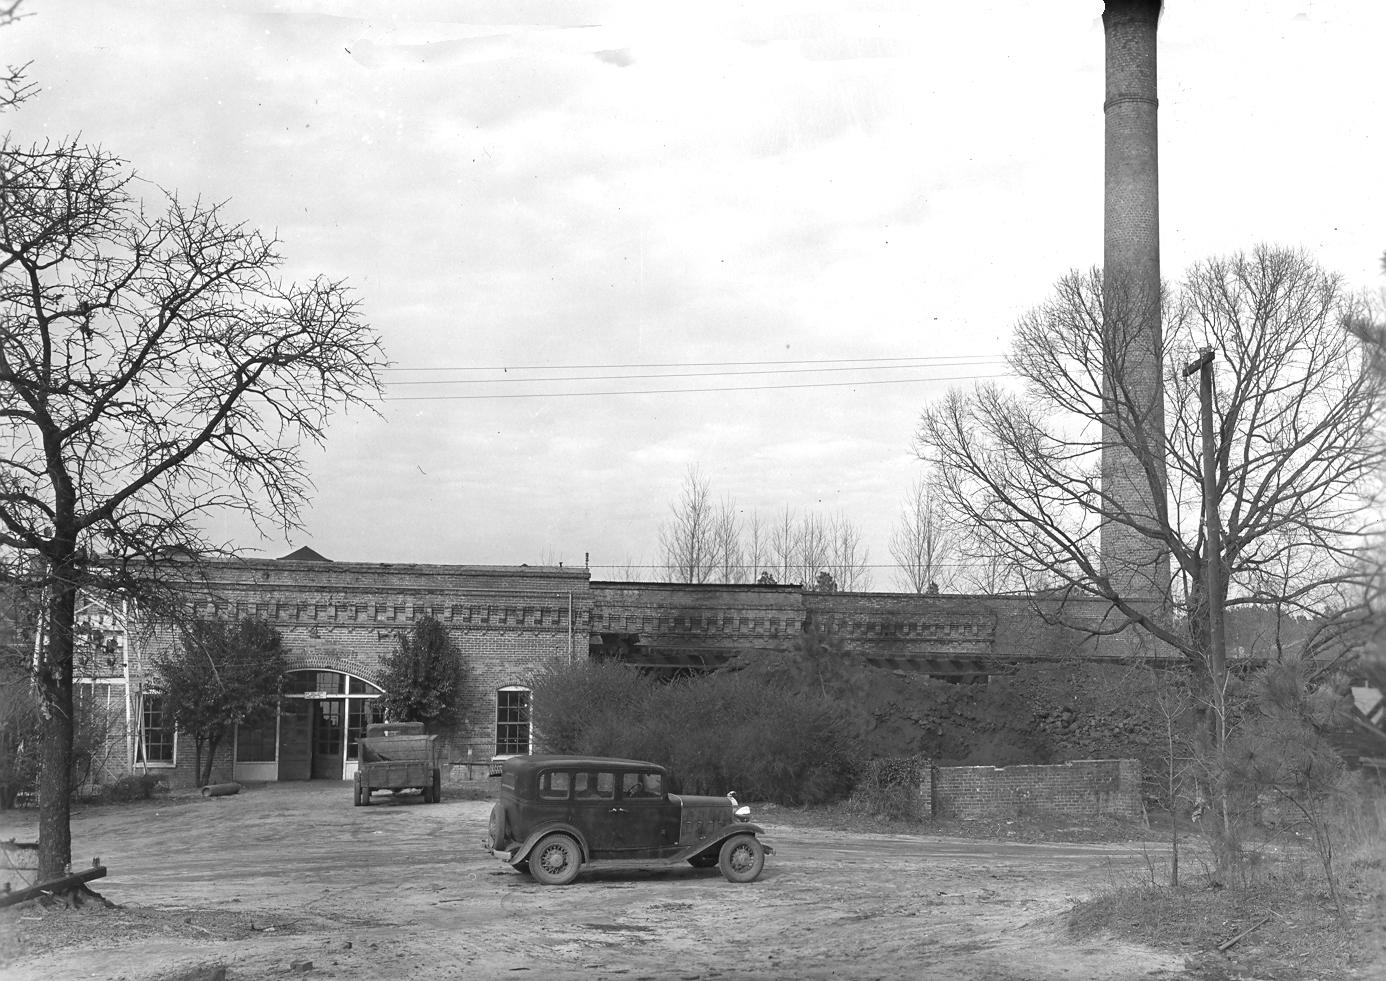 Steam Plant Vintage.jpg